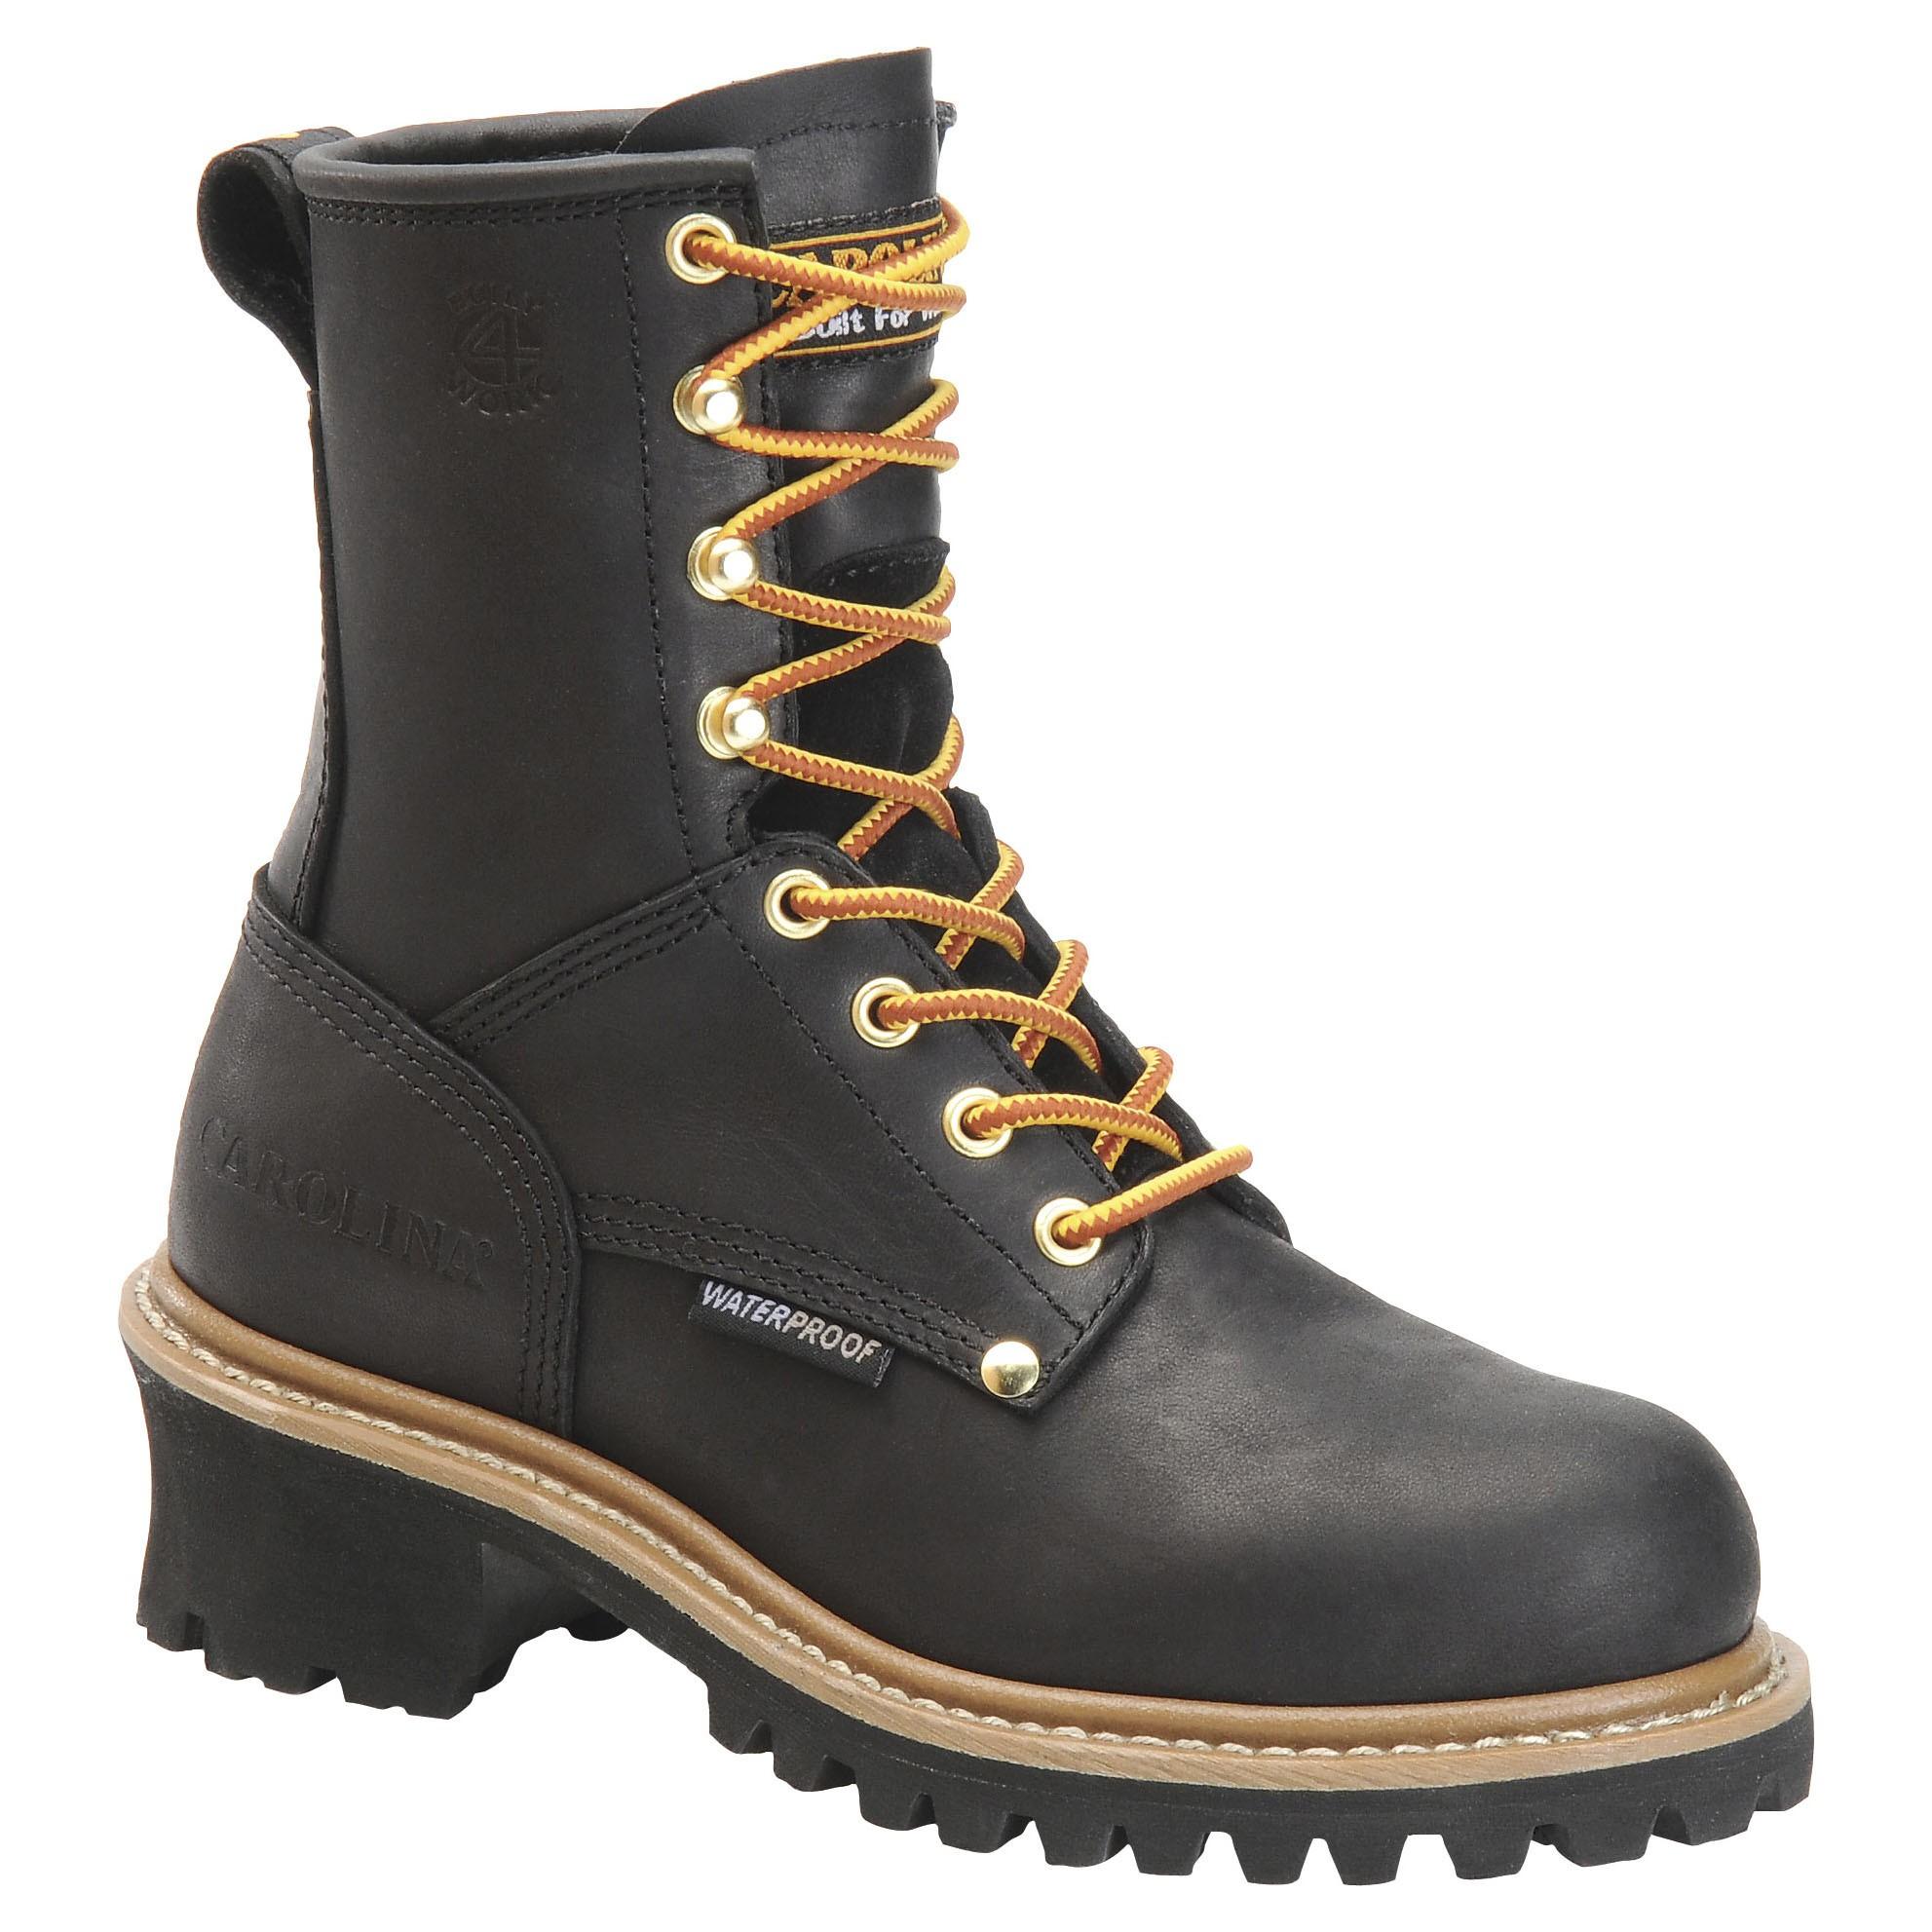 boots for women carolina womenu0027s waterproof logger boots - ca420 u0026 ca1420 DXGANLN